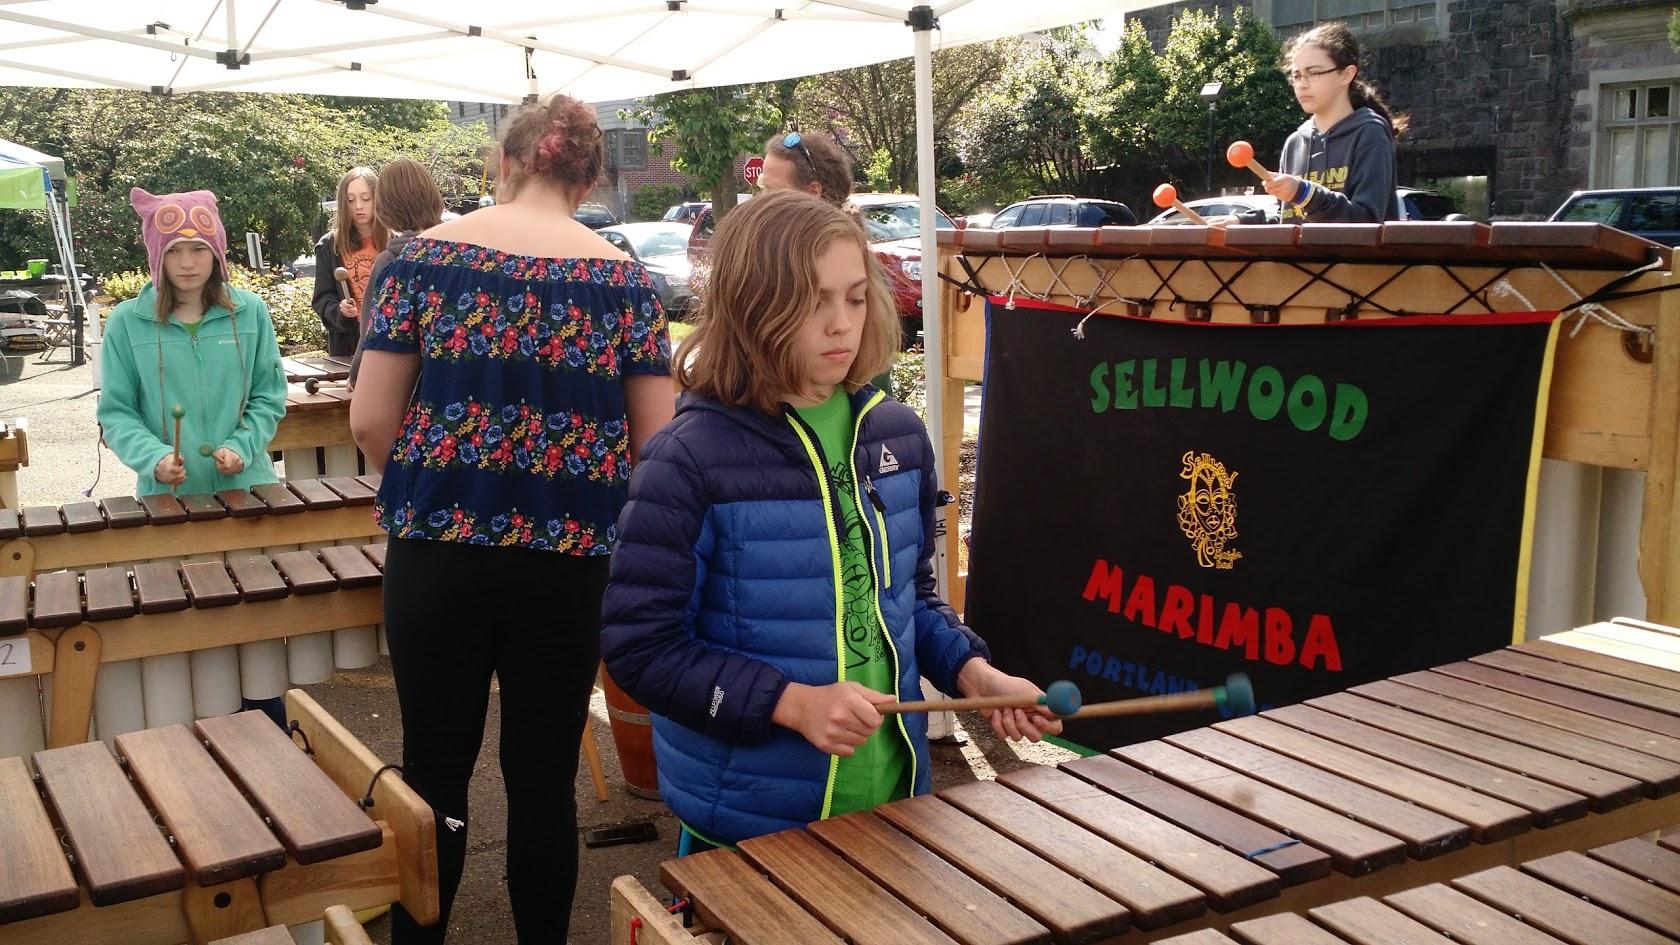 Sellwood Marimba Band -